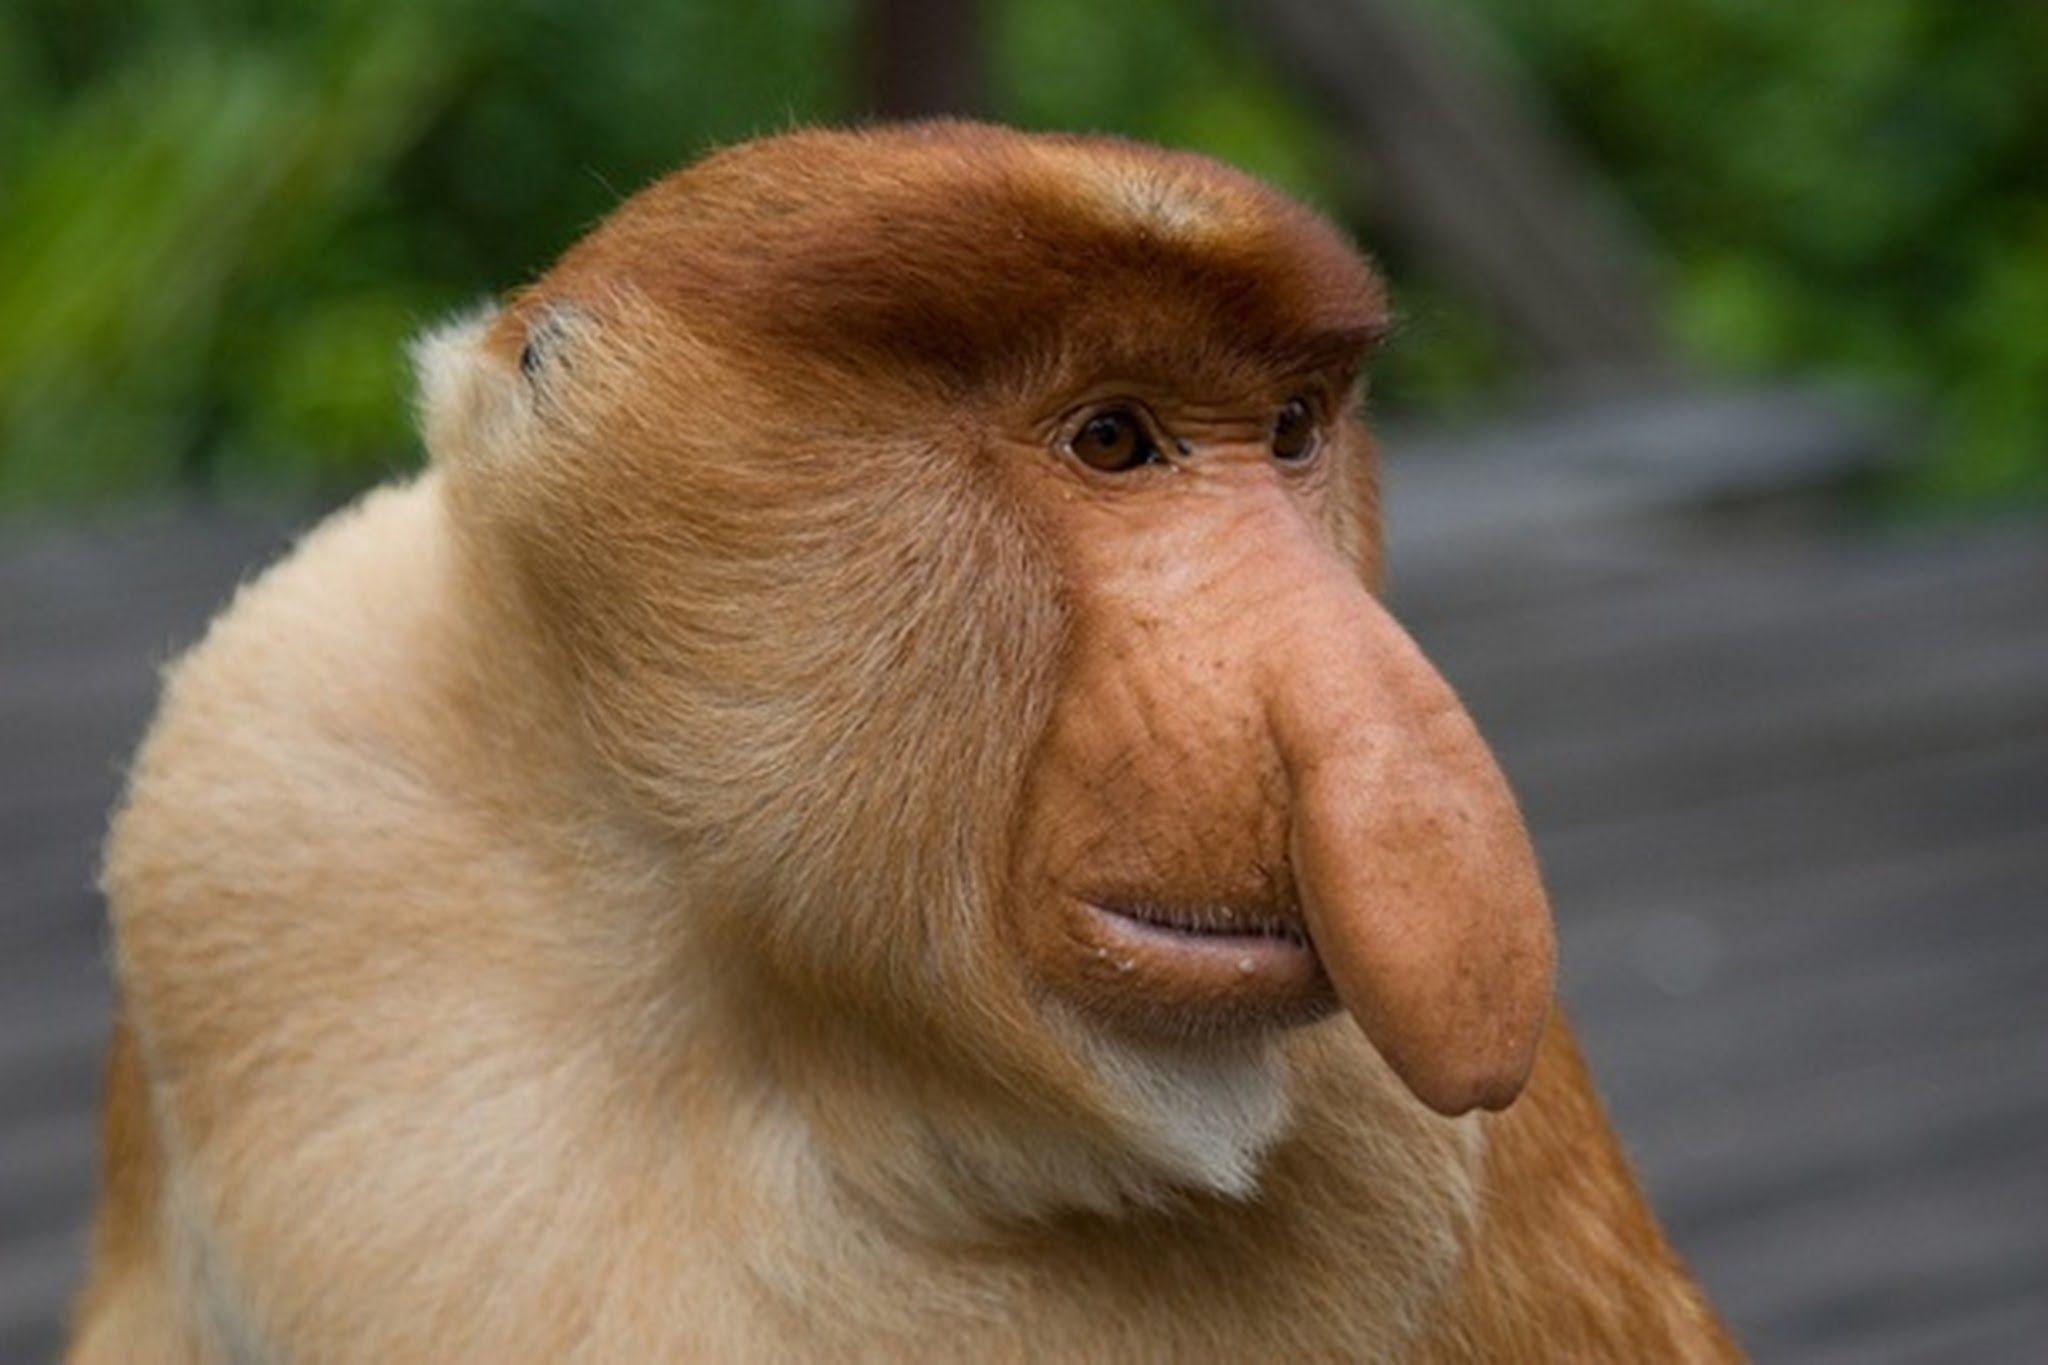 Big Nose Monkey Cerca Amb Google Animaux Animaux Bizarres